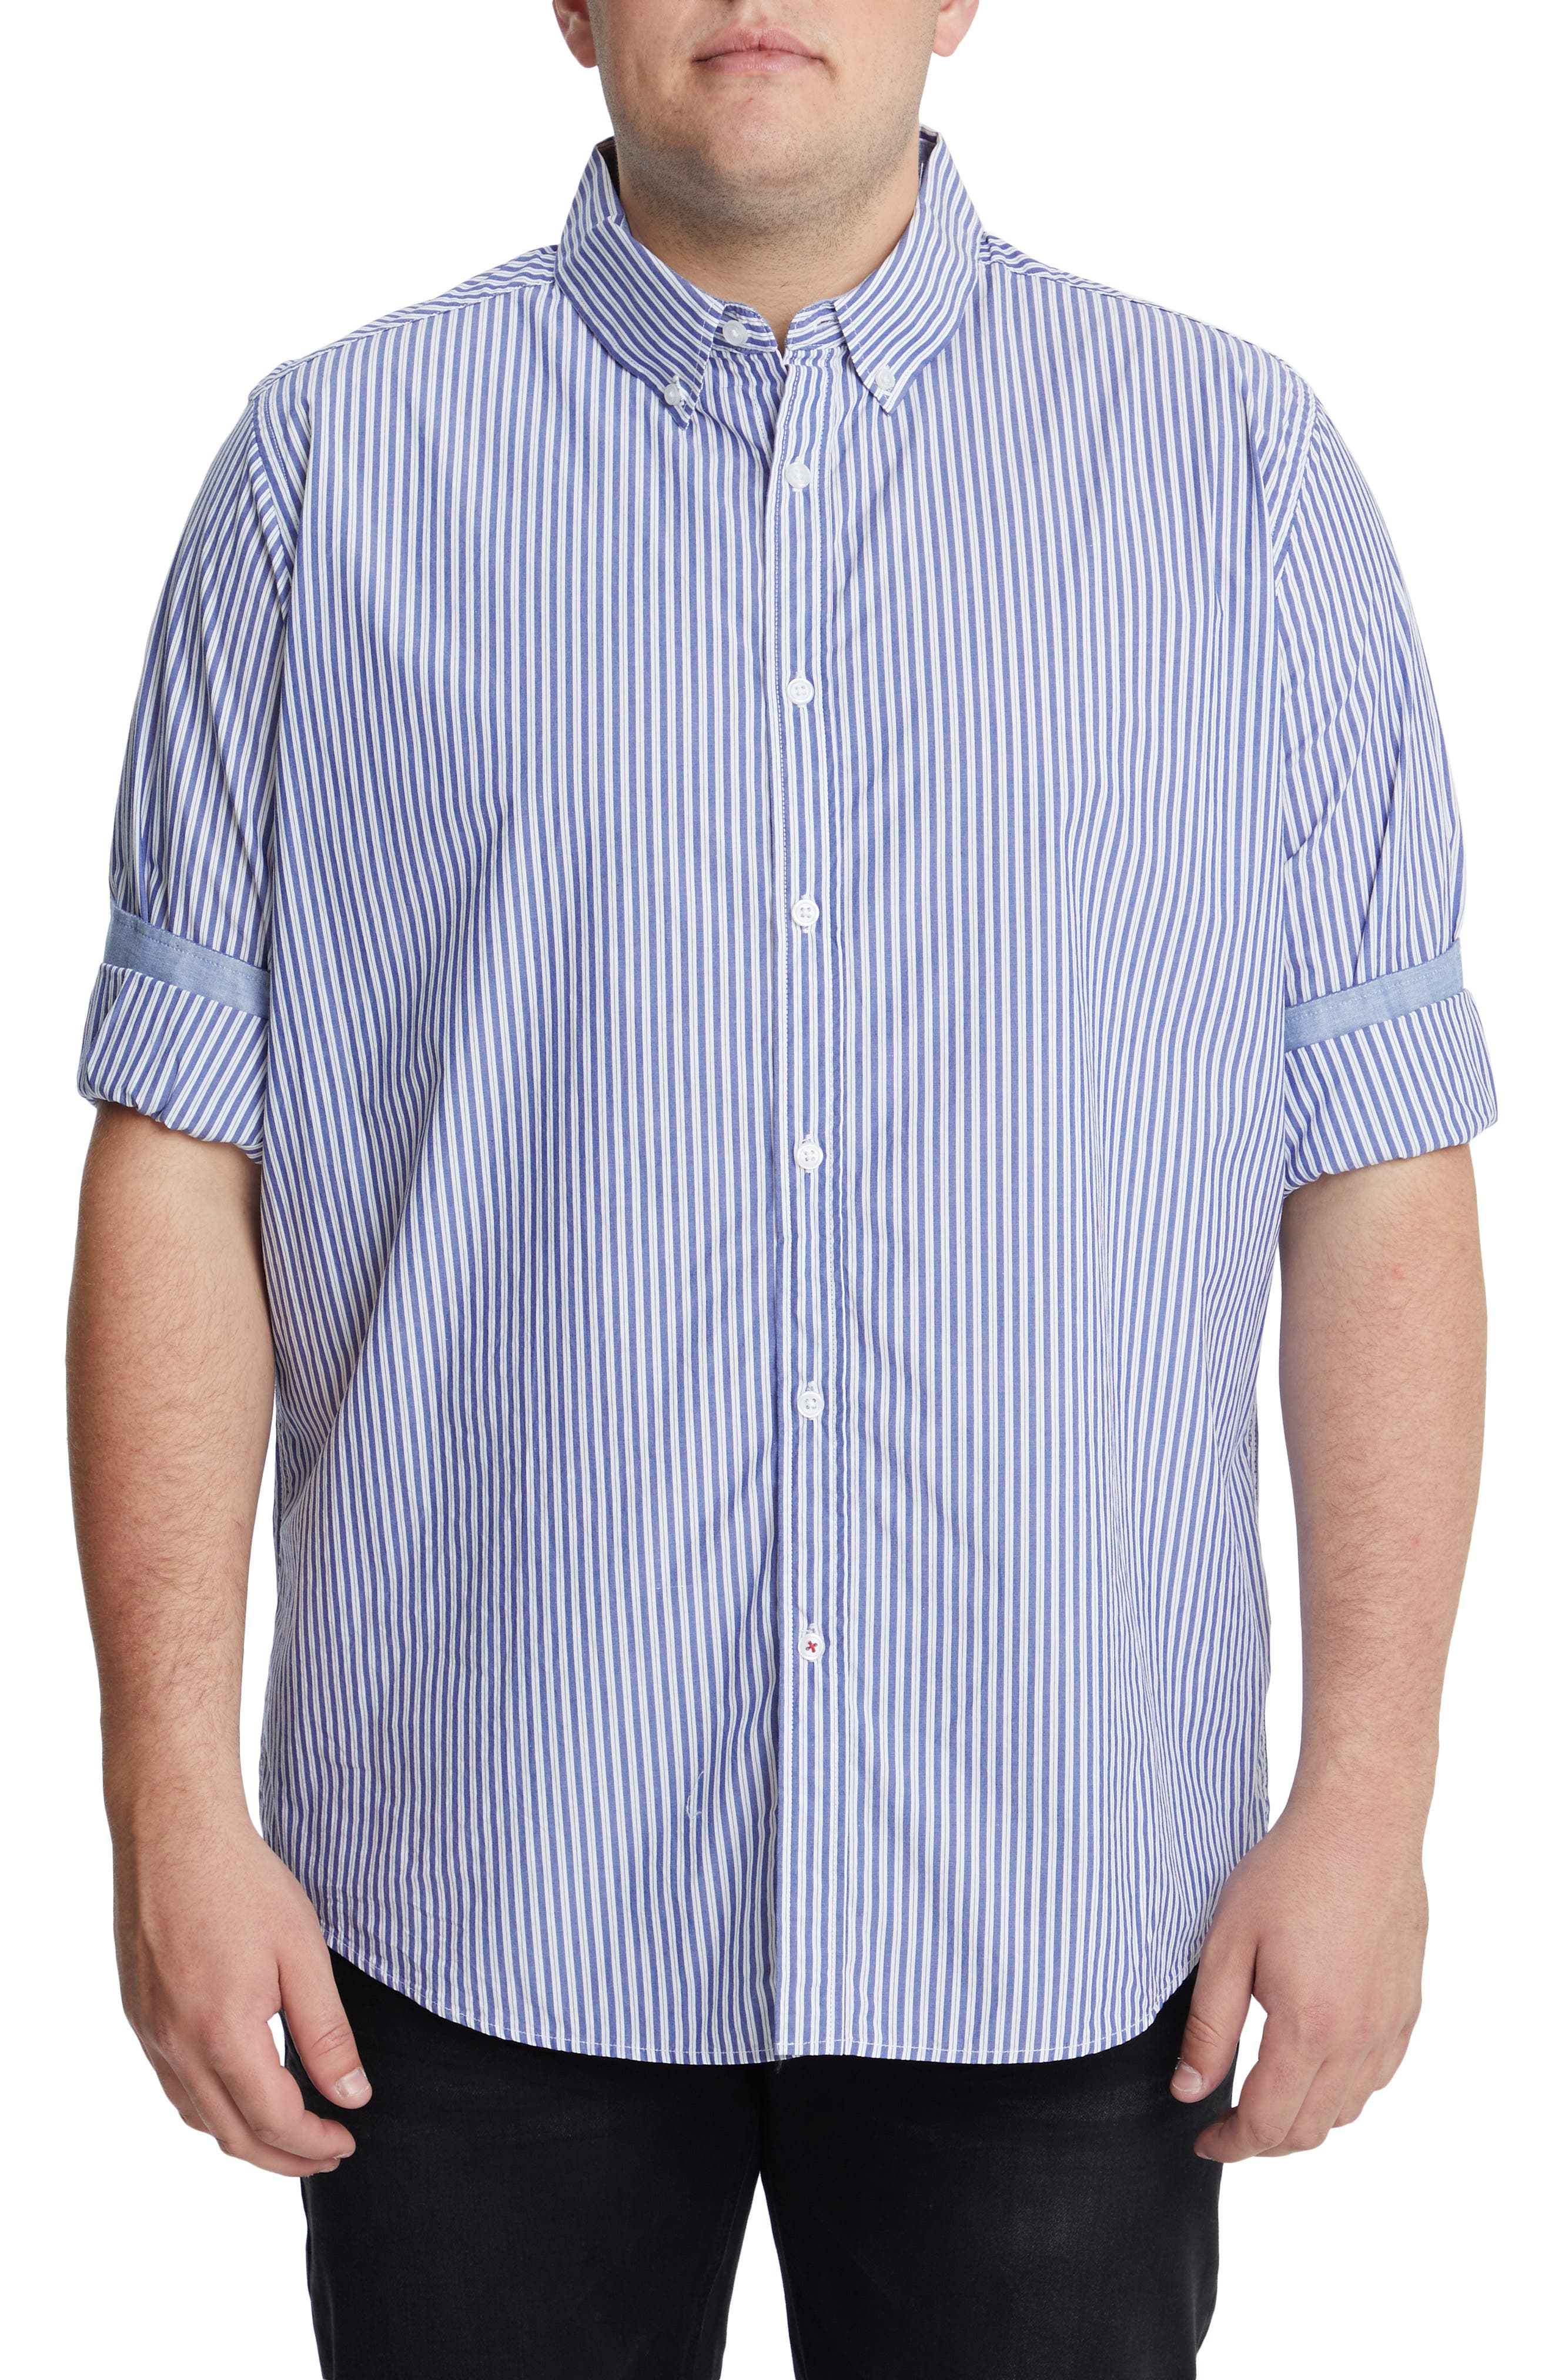 Men's Big & Tall Johnny Bigg Forrest Stretch Stripe Button-Down Shirt